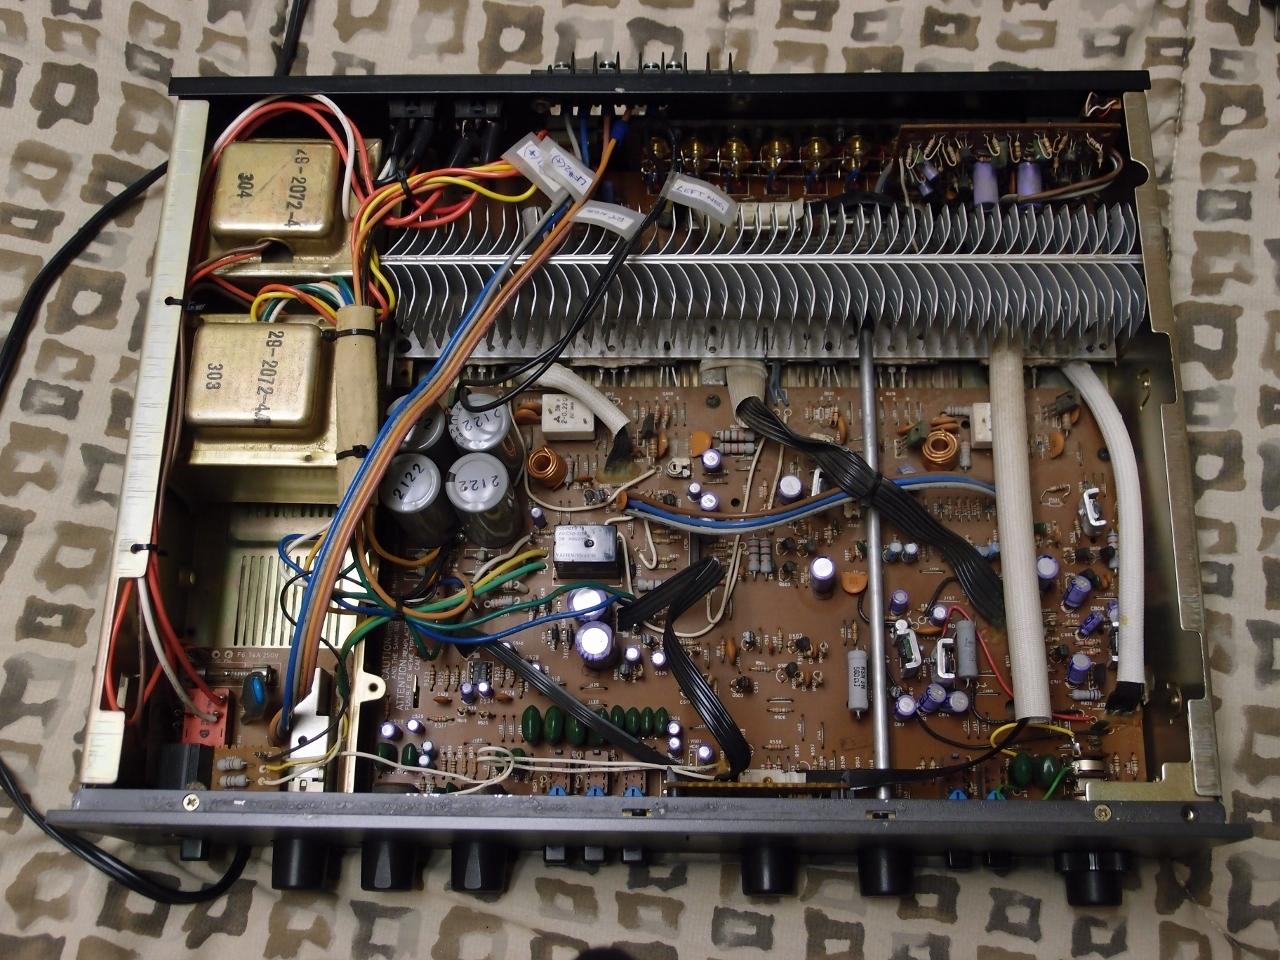 fs nad 3150 integrated amplifier polk audio rh forum polkaudio com Nad 3150 Parts Nad 3150 Integrated Amp